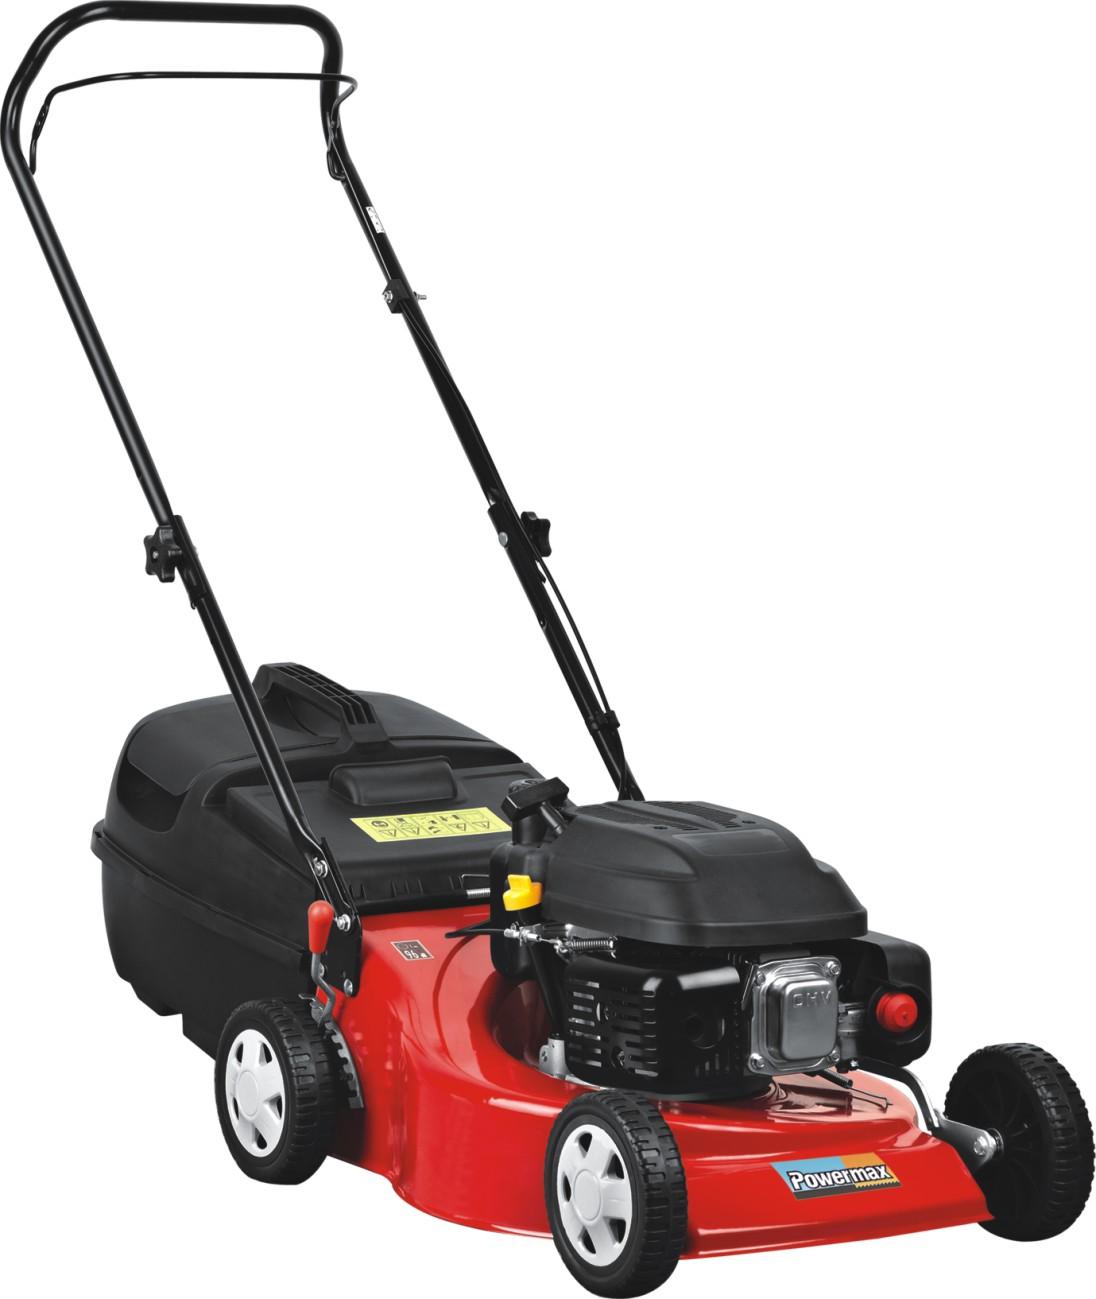 Máy cắt cỏ đẩy tay One Power LR46AP hinh anh 1